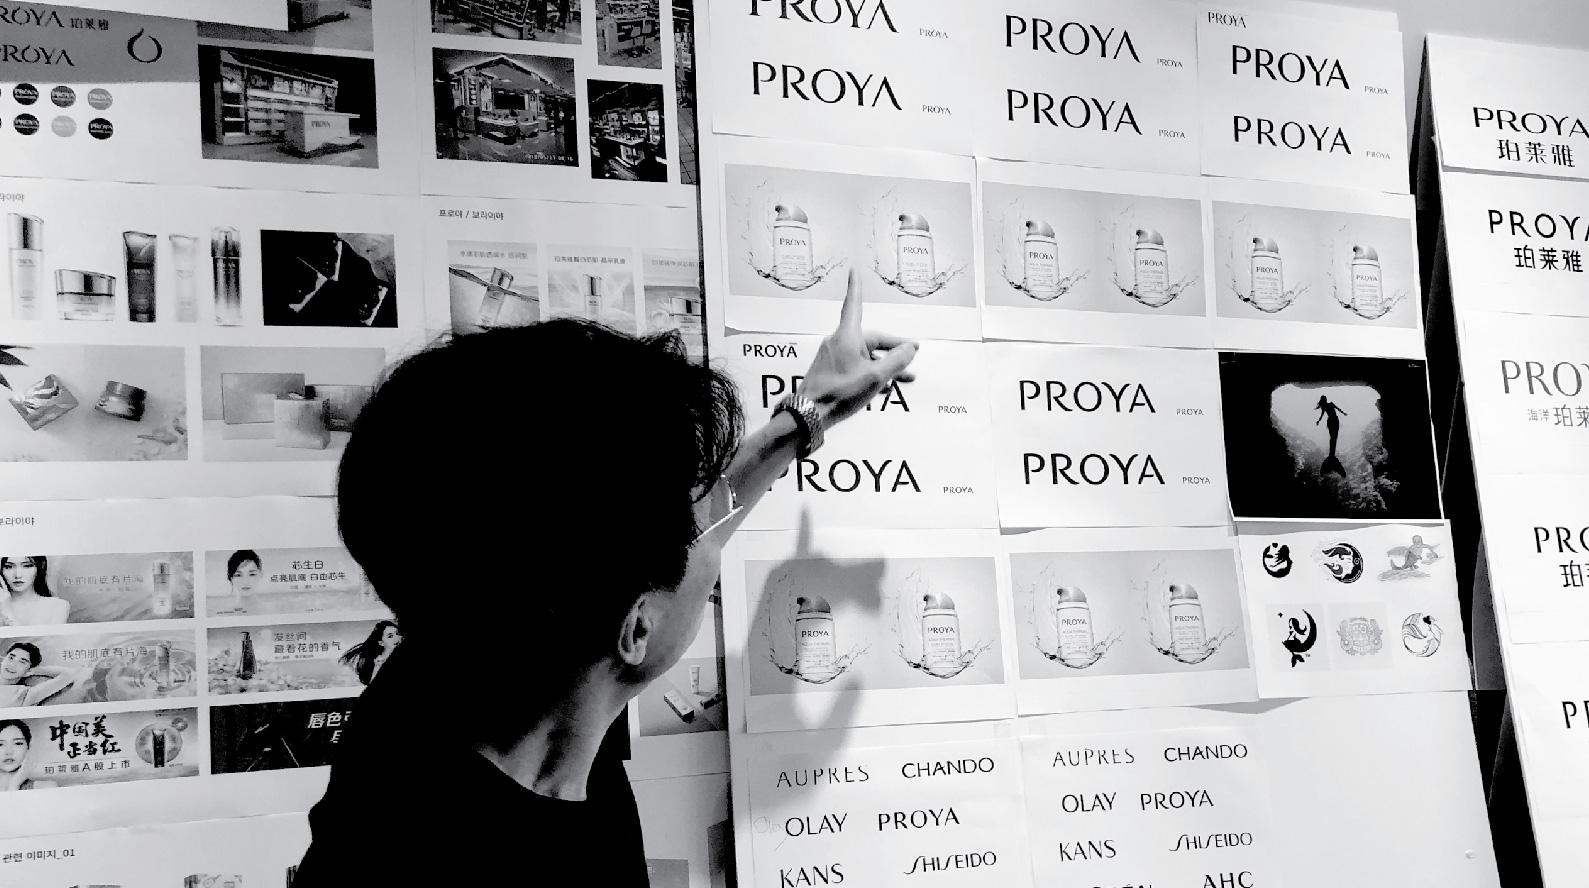 proya_05.jpg